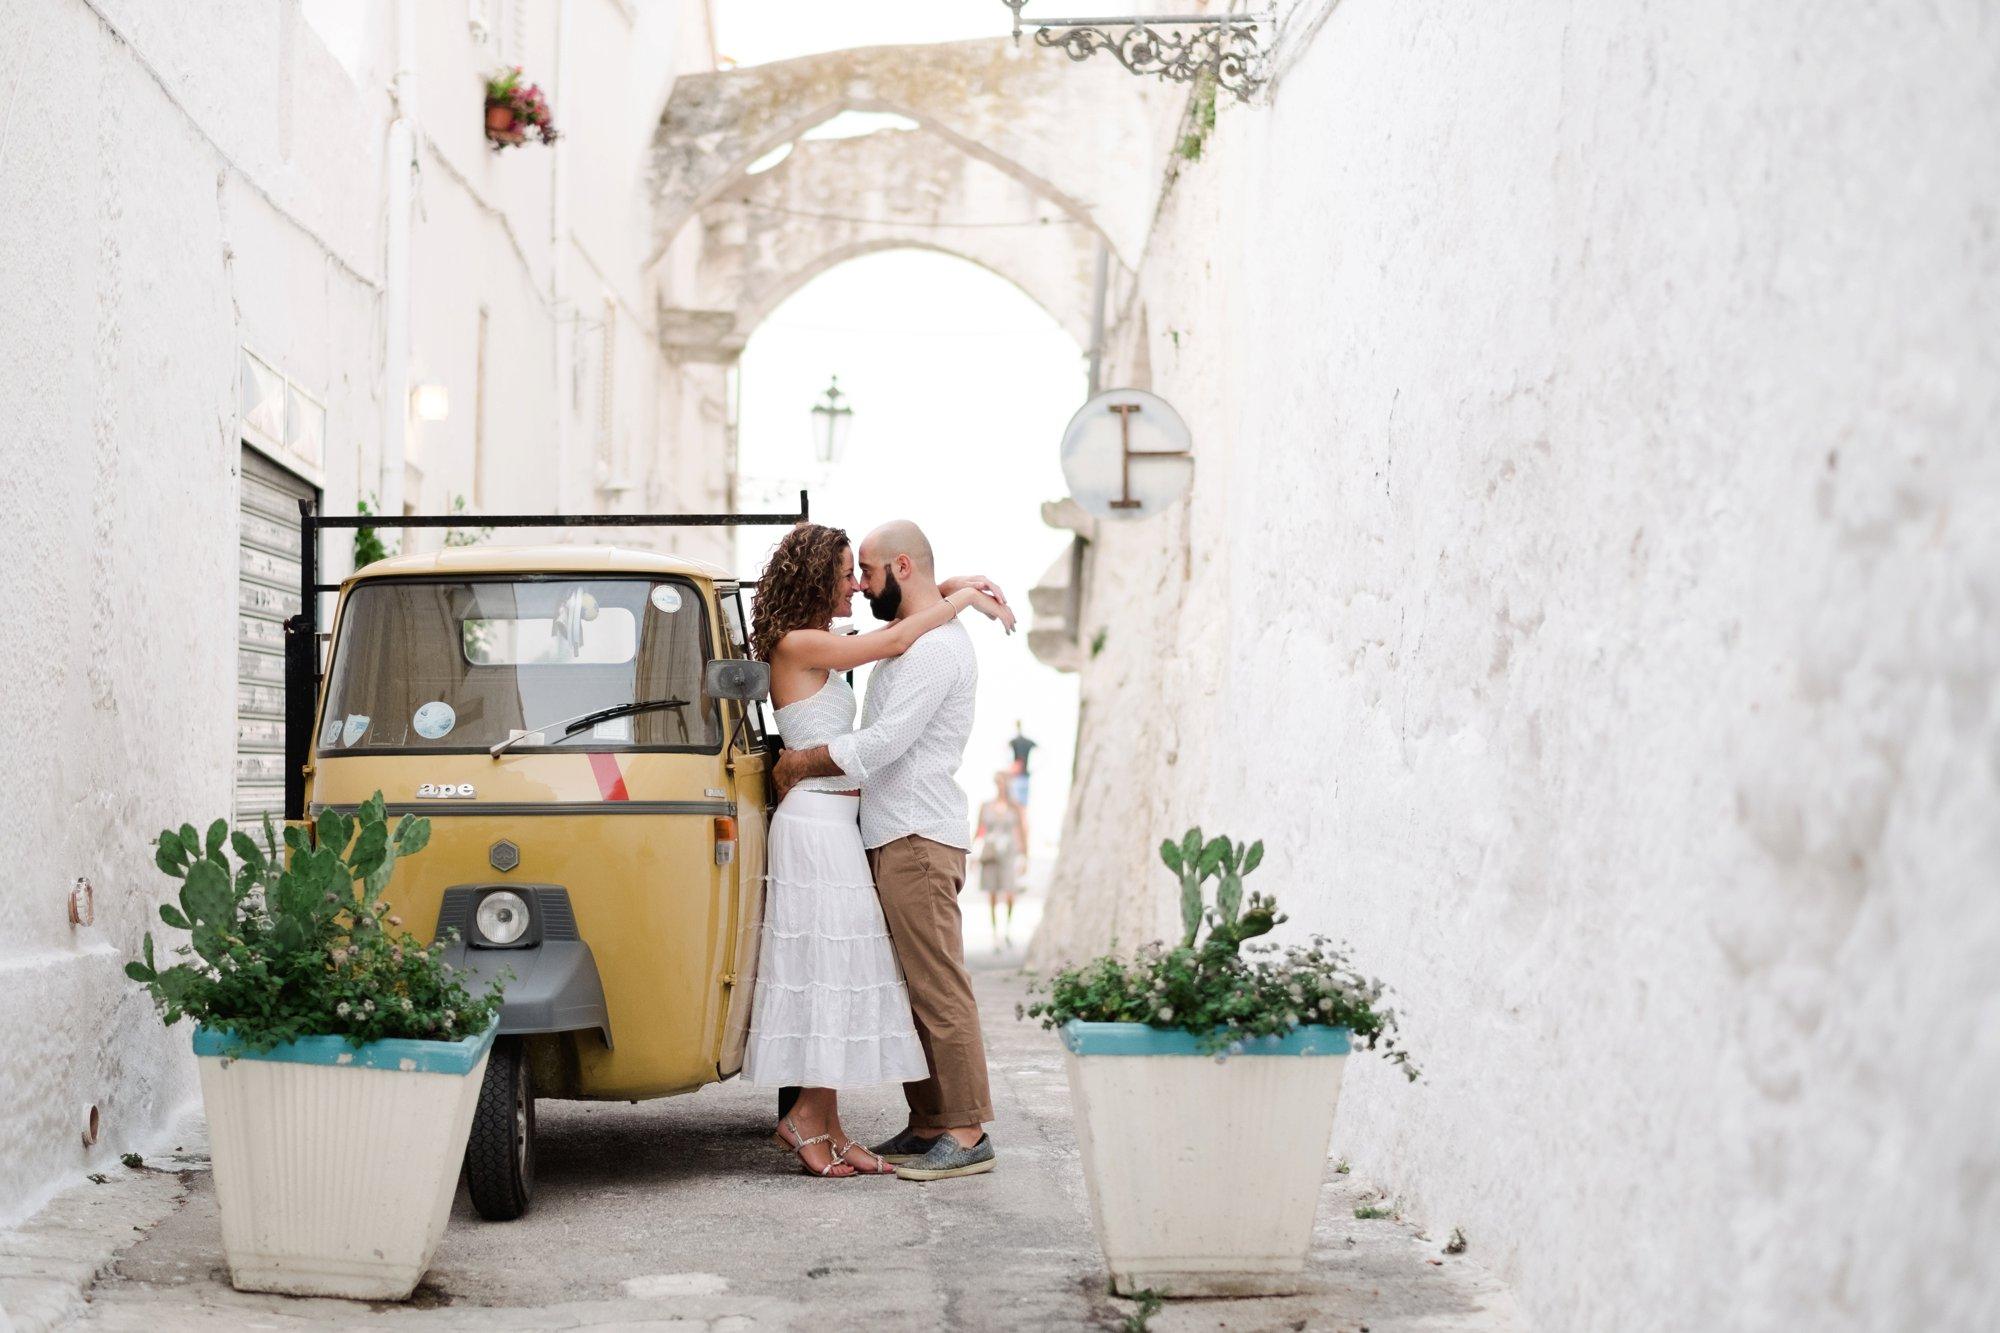 Apulia wedding photographer, Apulia wedding photographer – Alberobello – Vieste – Ostuni